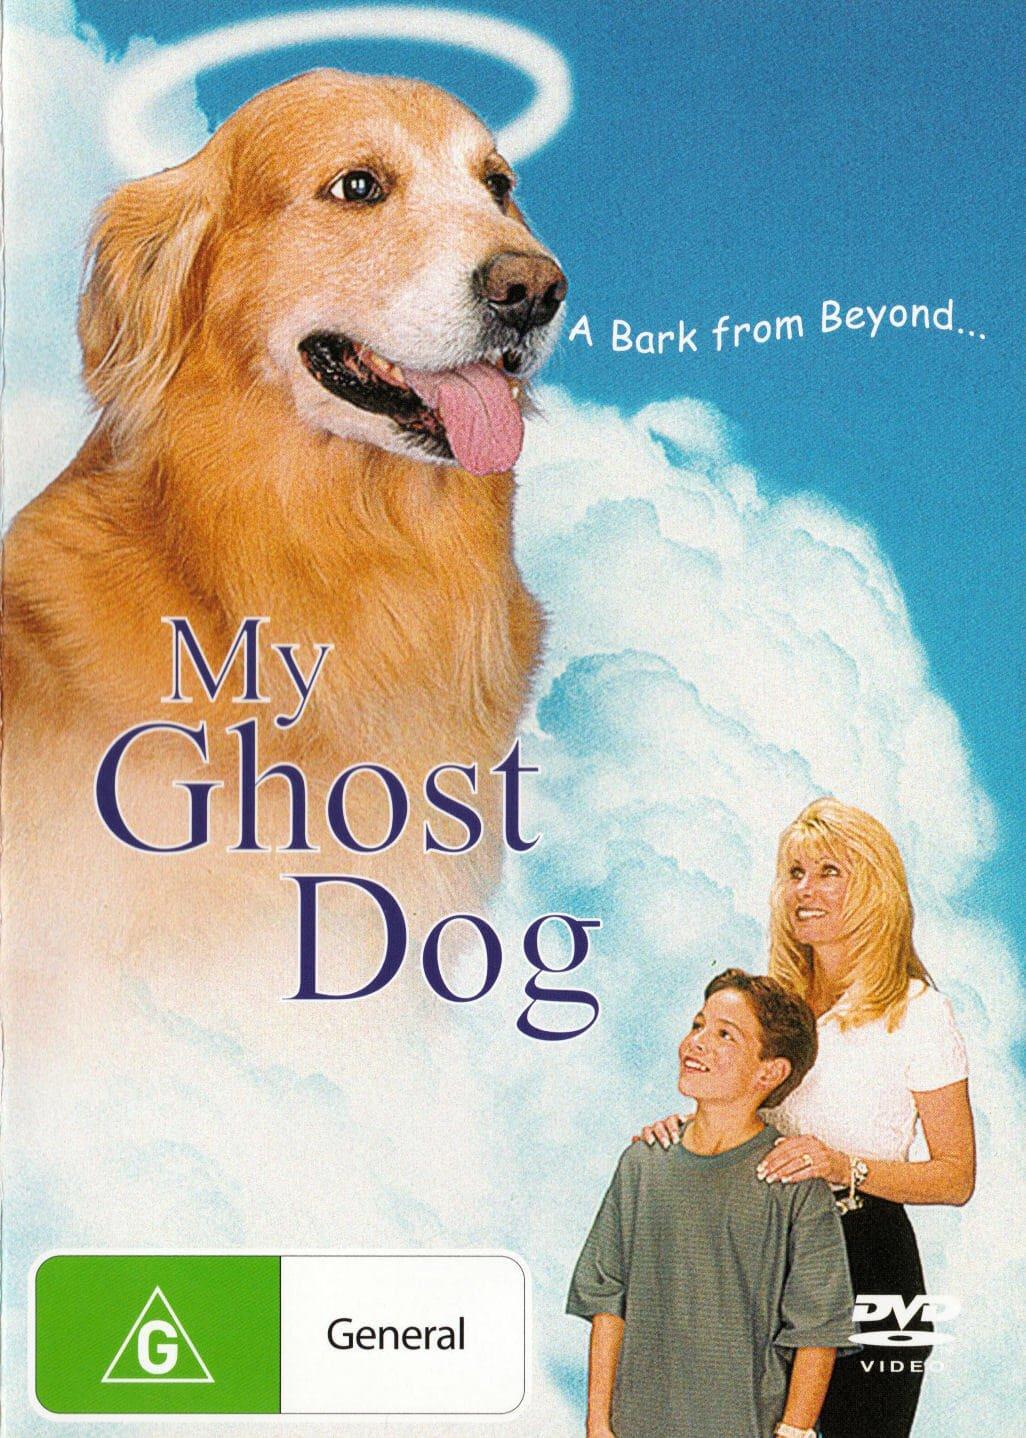 My Ghost Dog